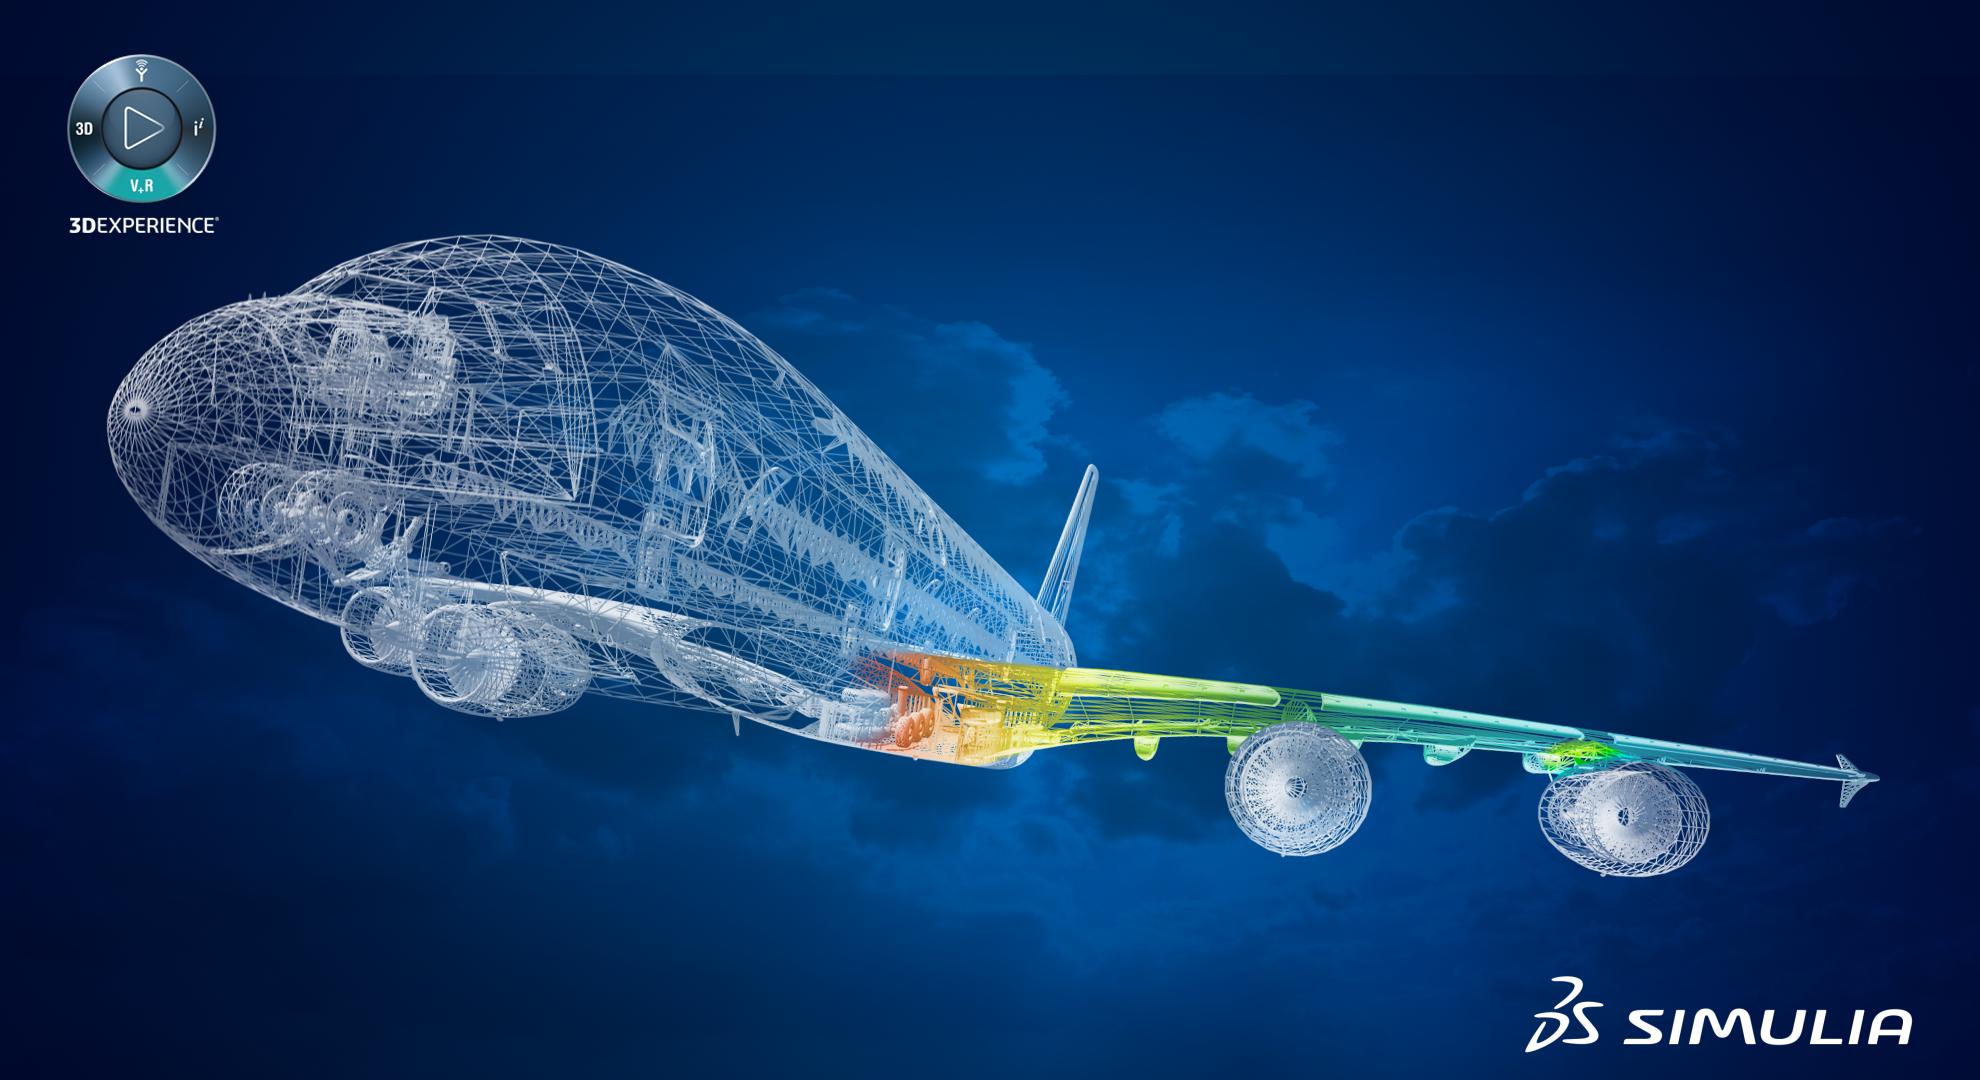 KEONYS-Dassault-Systemes-simulation-conference-utilisateurs